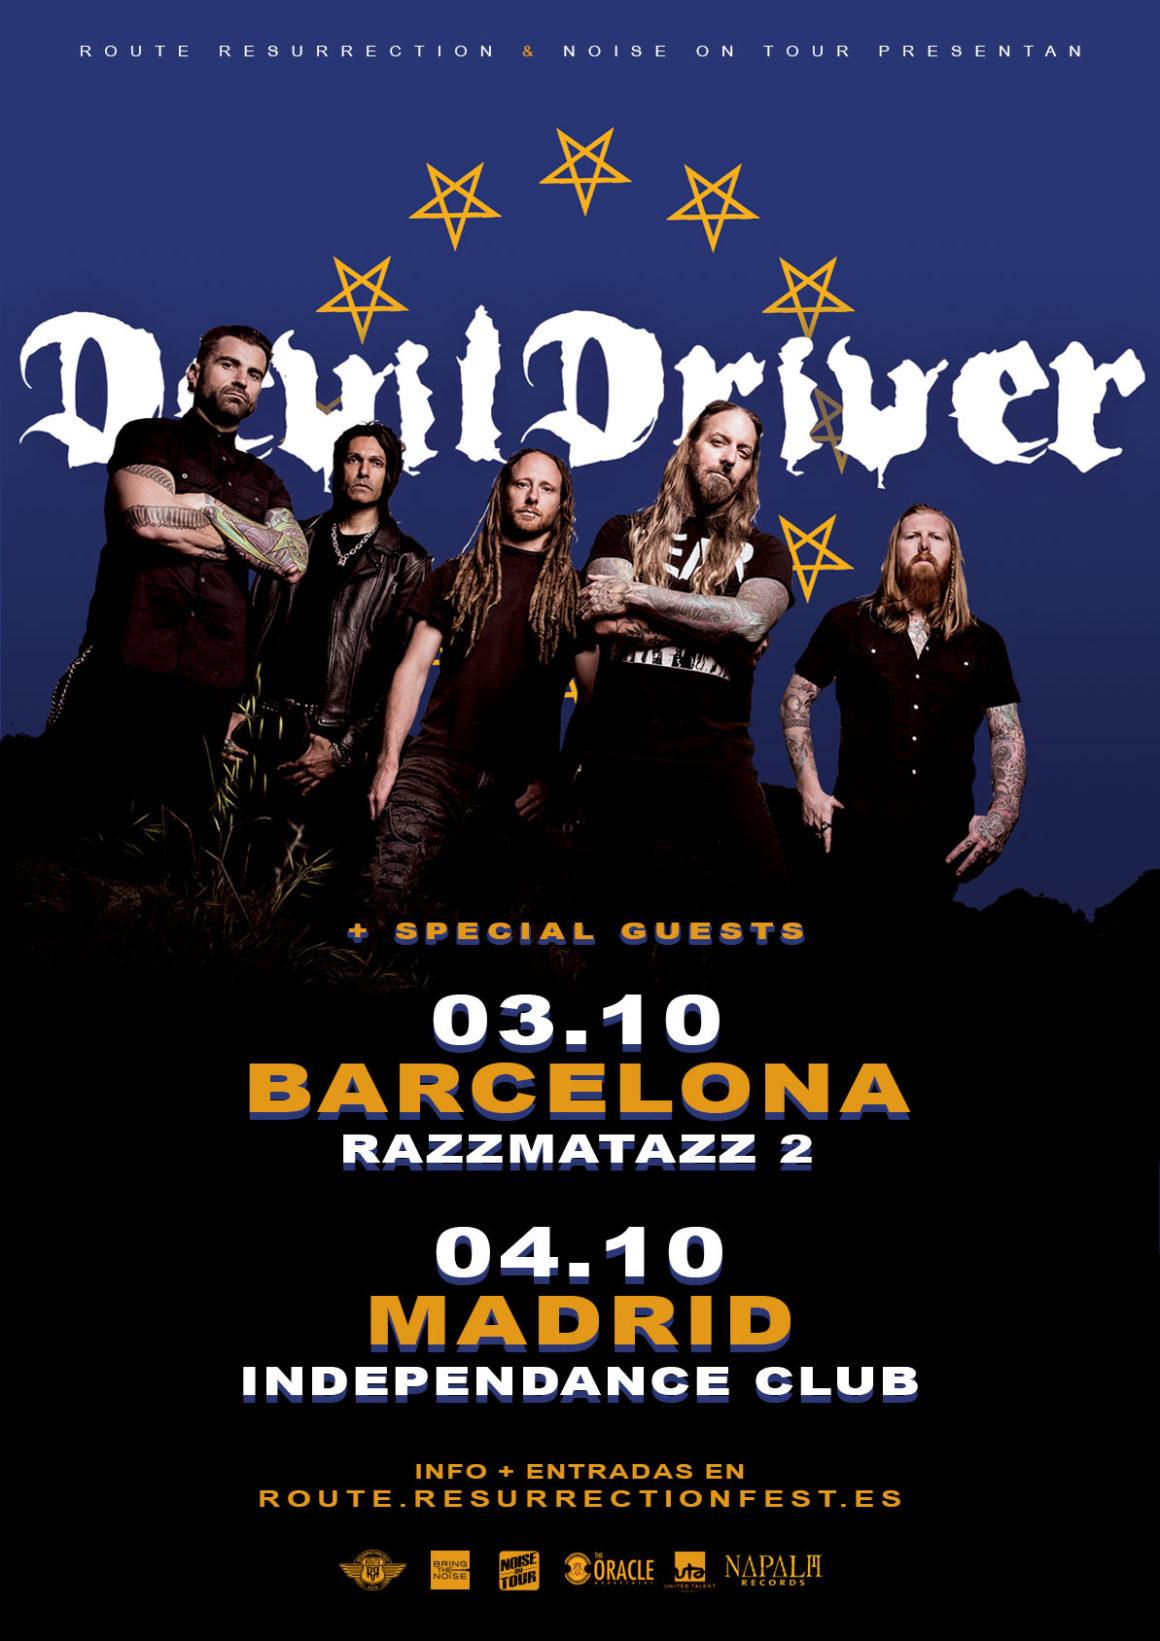 Nueva gira Route Resurrection: DevilDriver